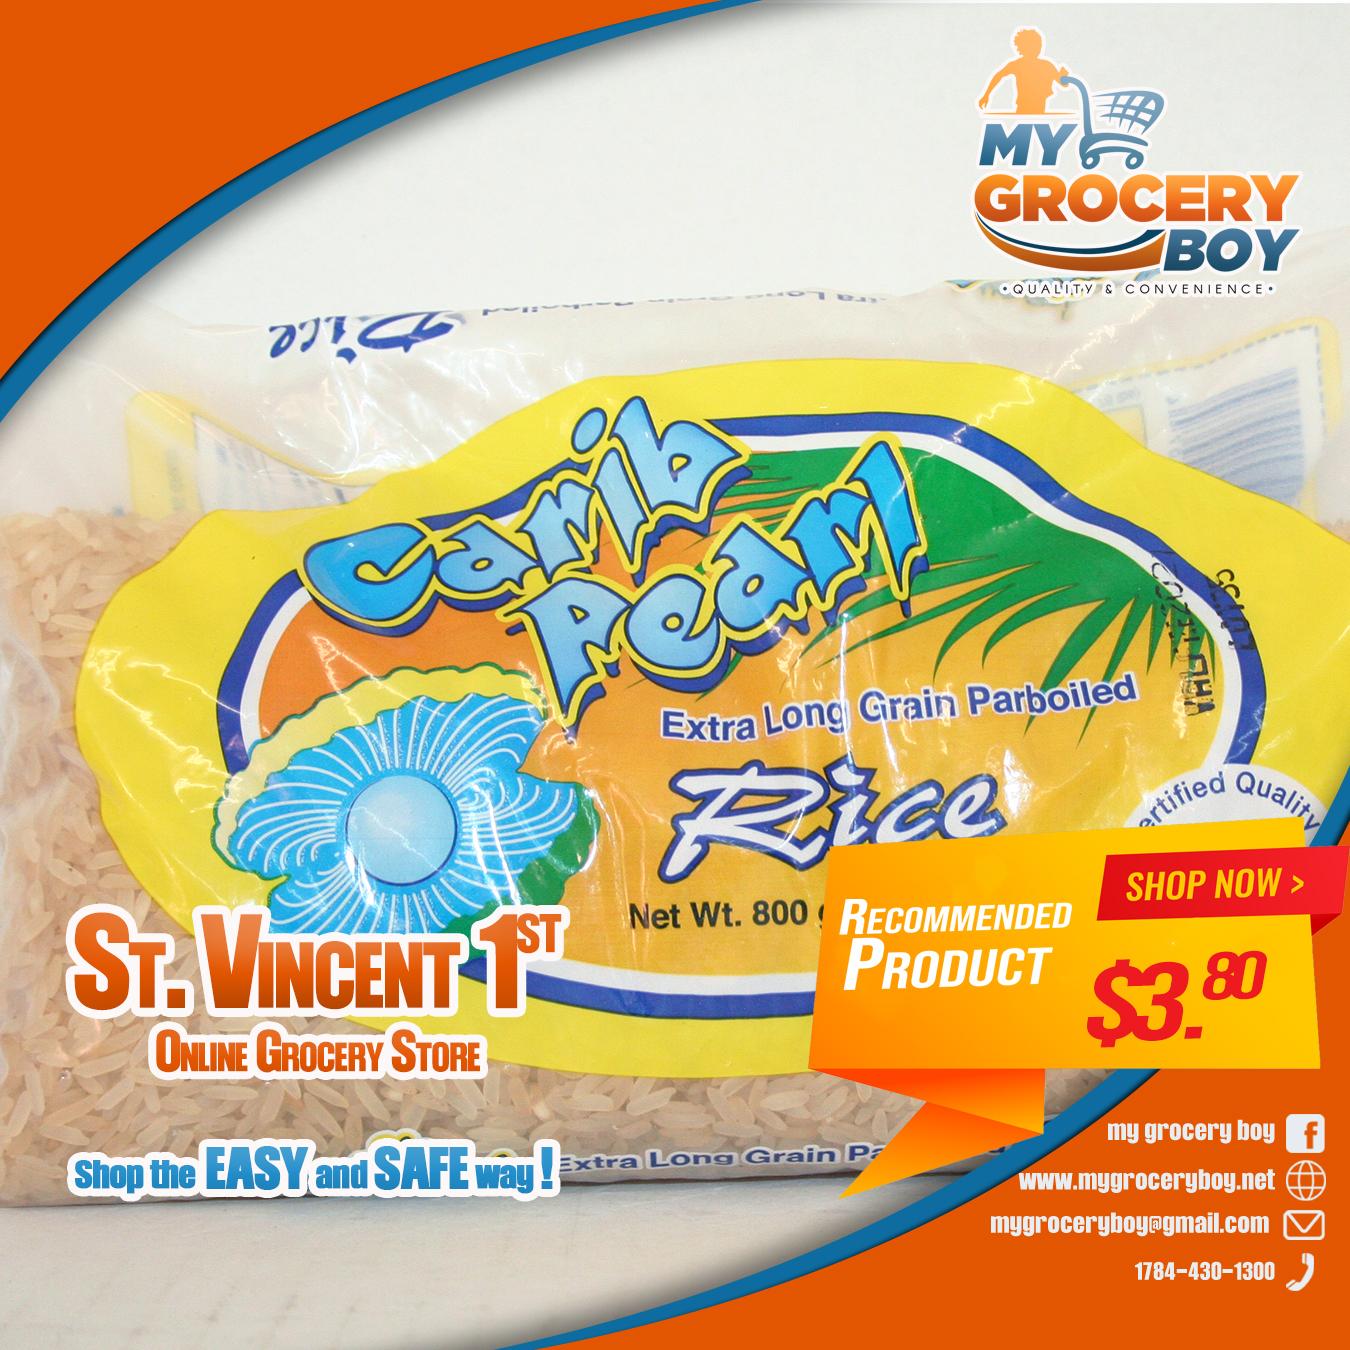 Carib pearl Rice 1lb